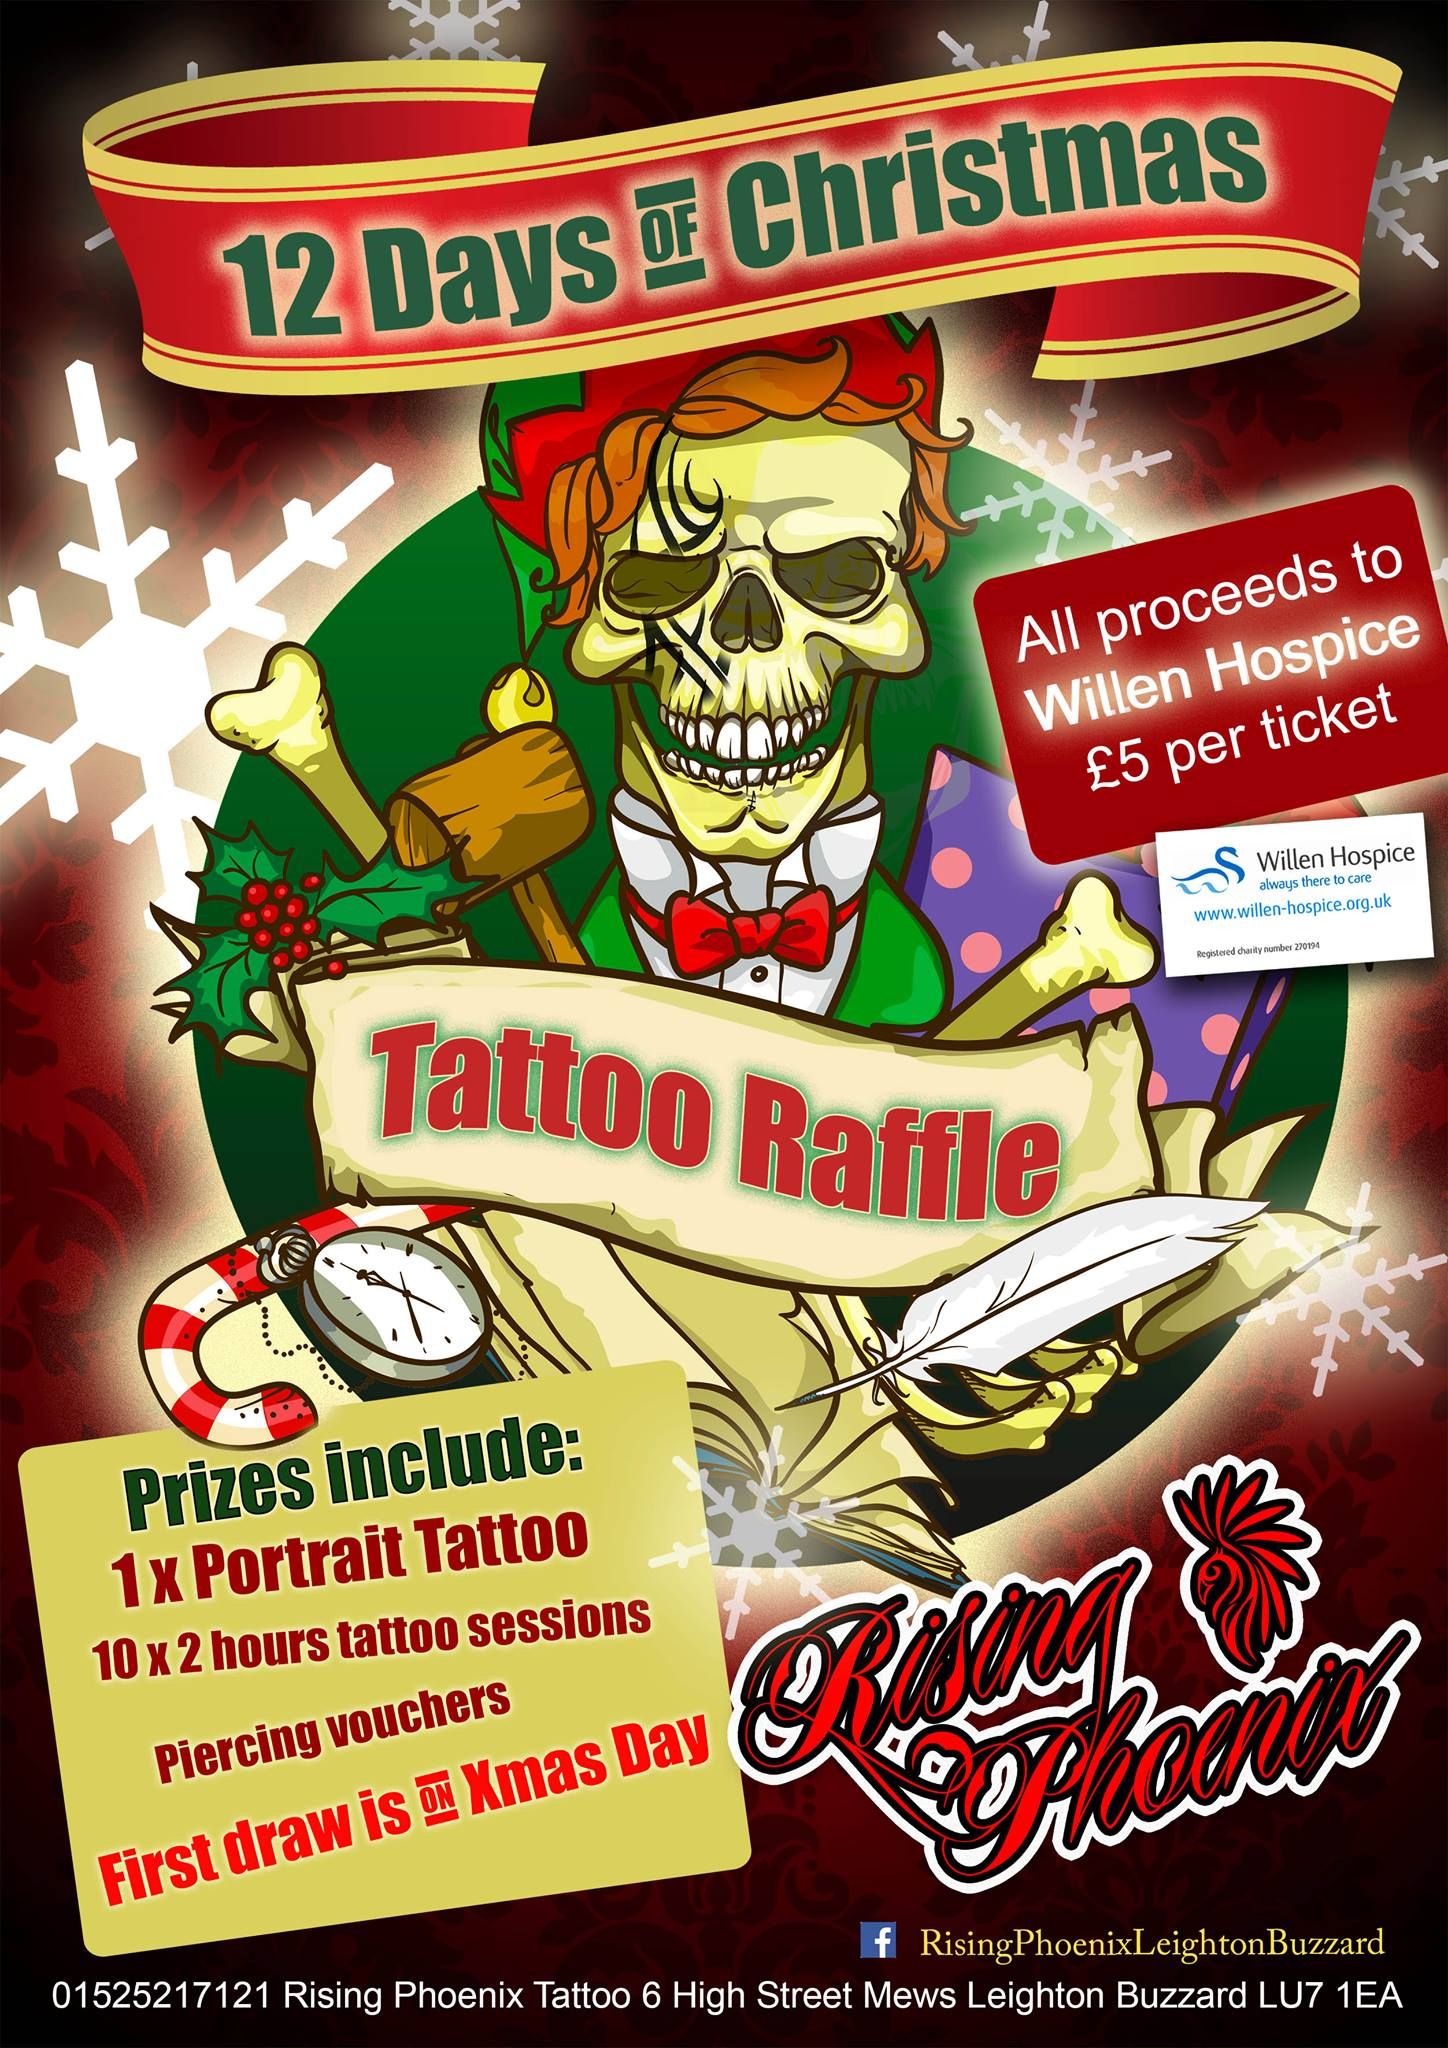 12 Days of Christmas Tattoo Raffle